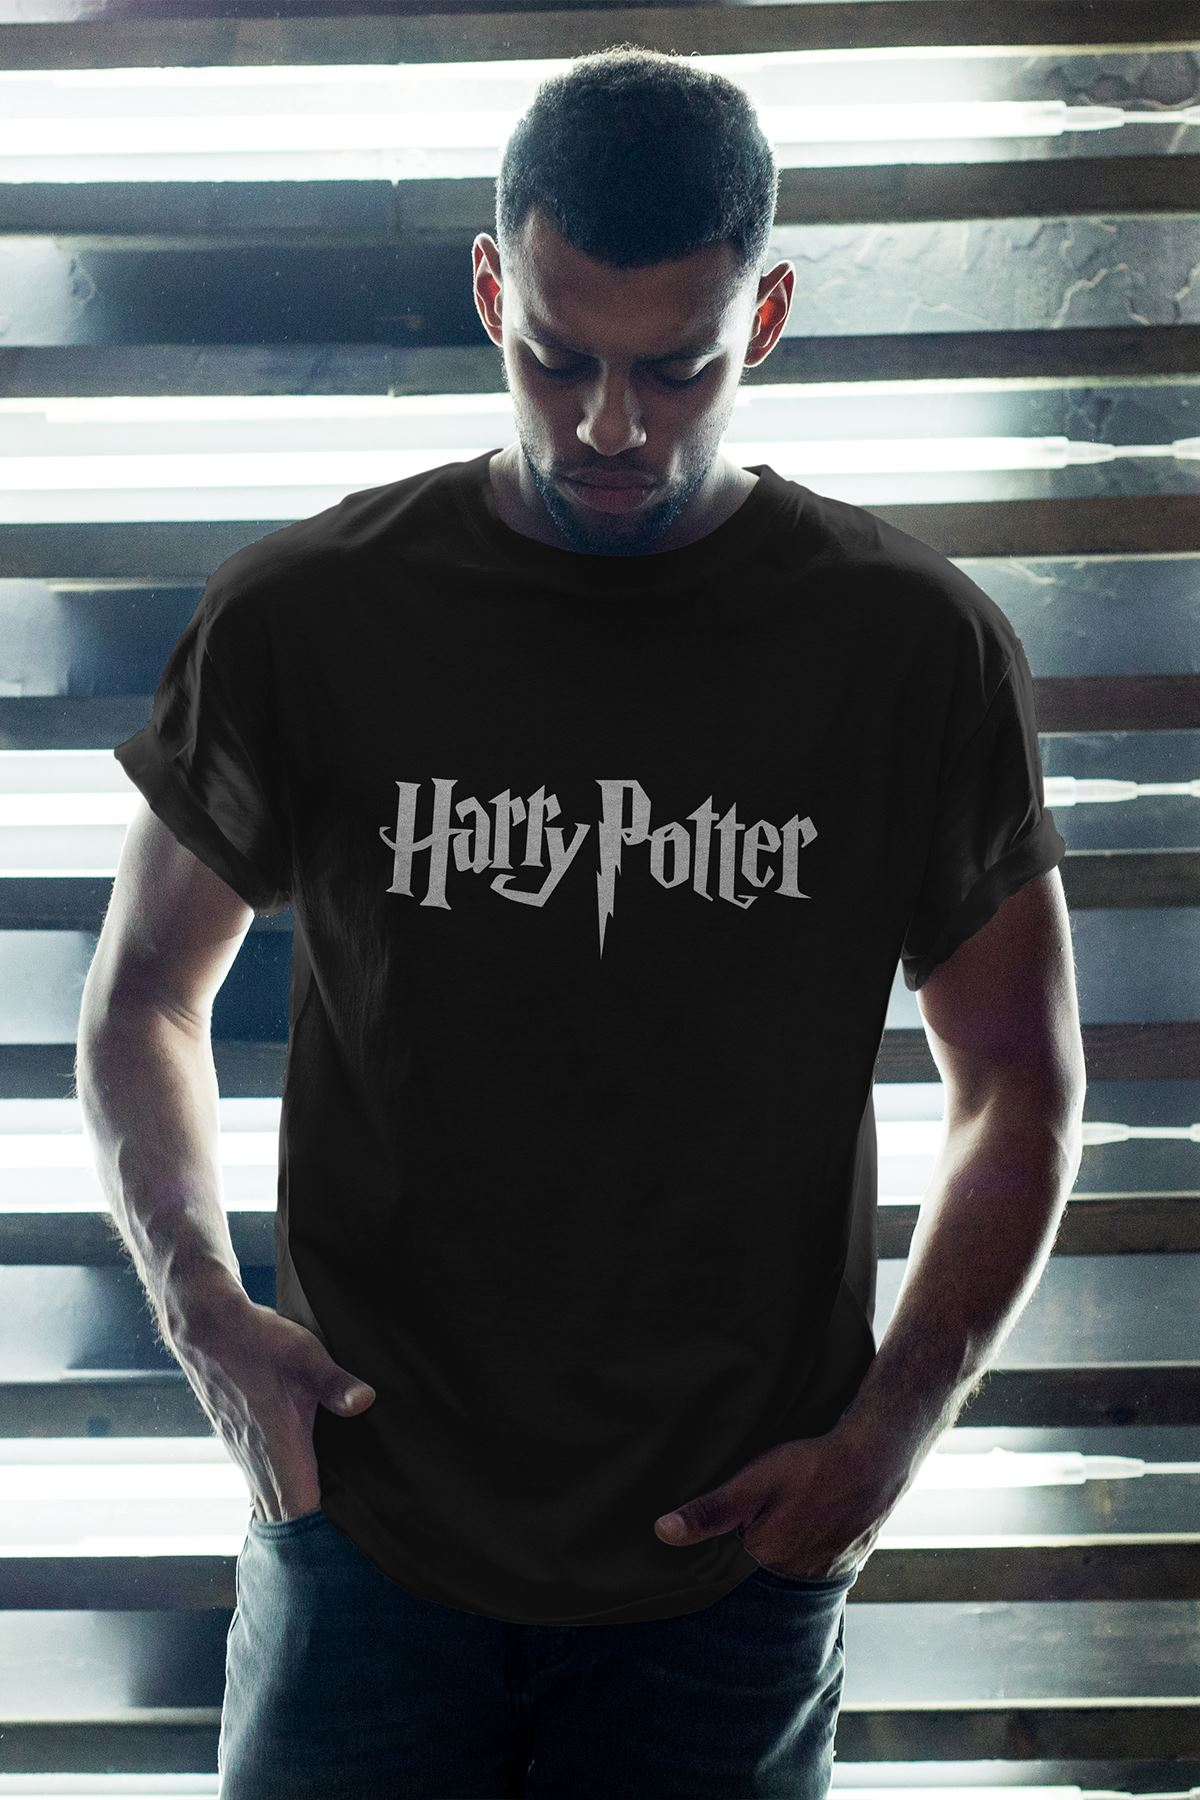 Harry Potter Siyah Erkek Oversize Tshirt - Tişört